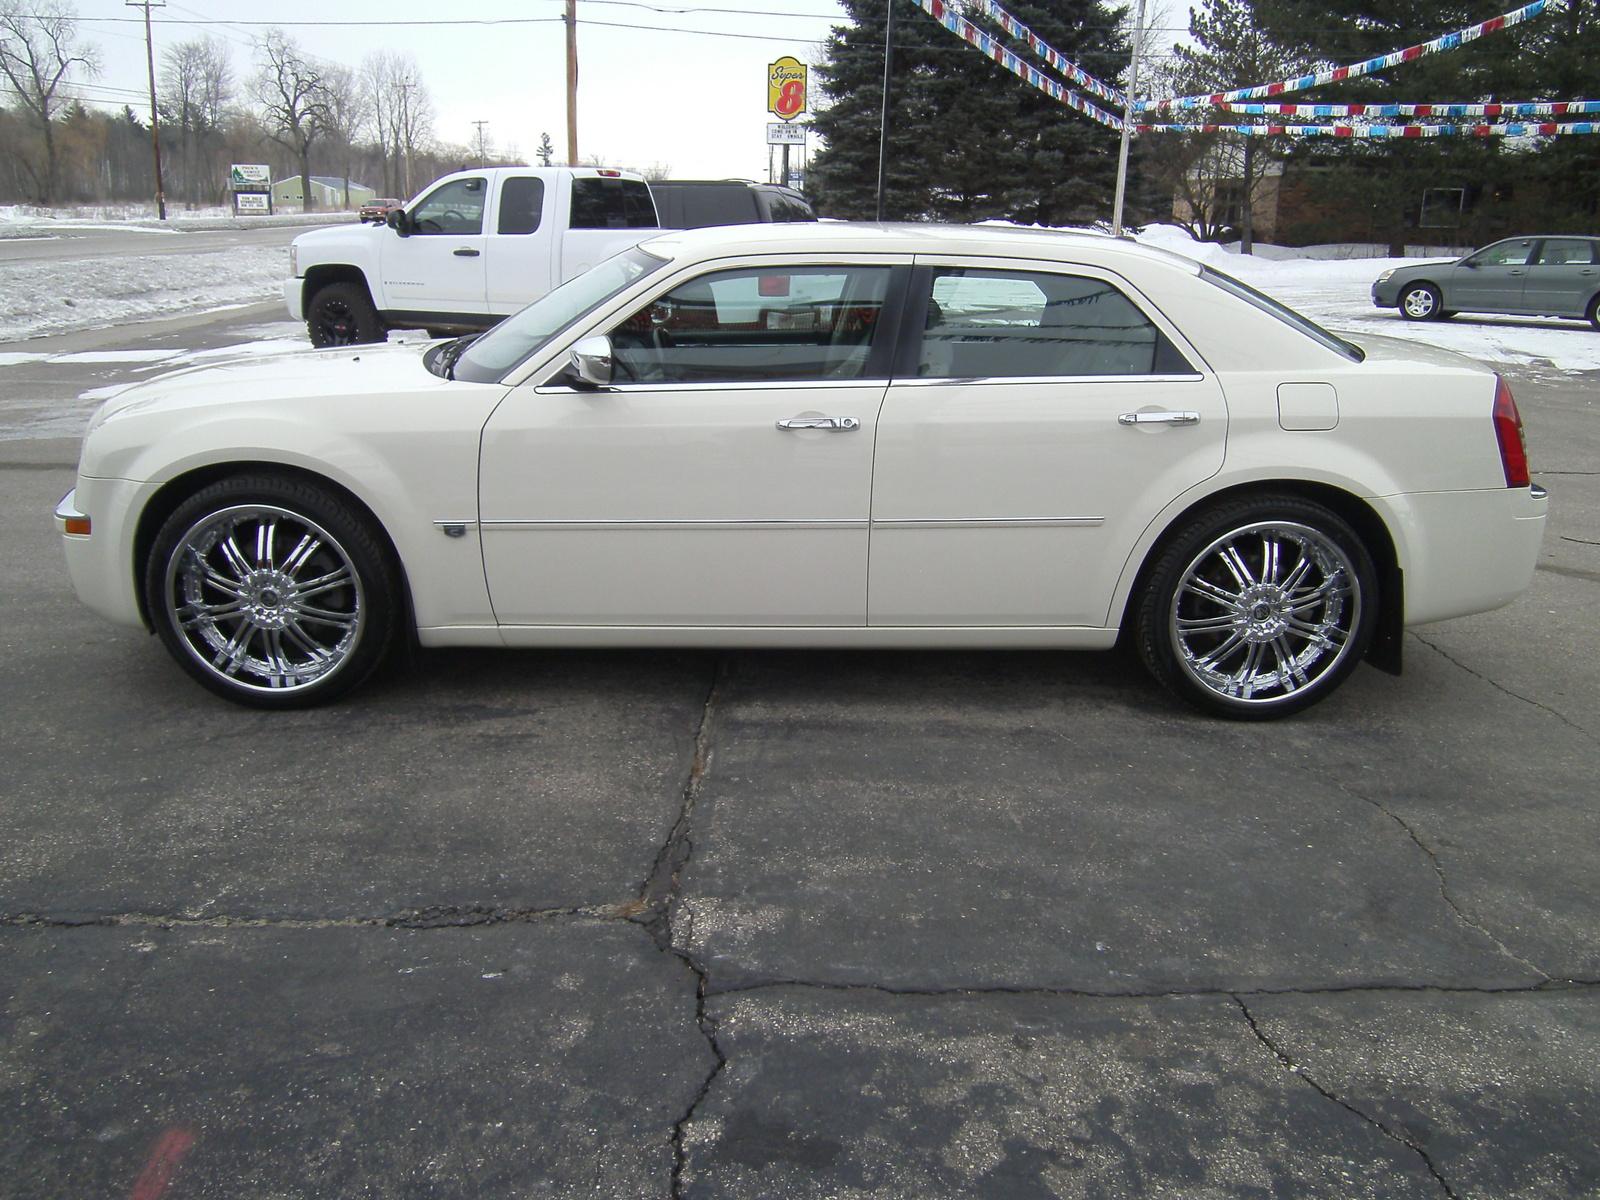 2006 Chrysler 300 Pictures Cargurus